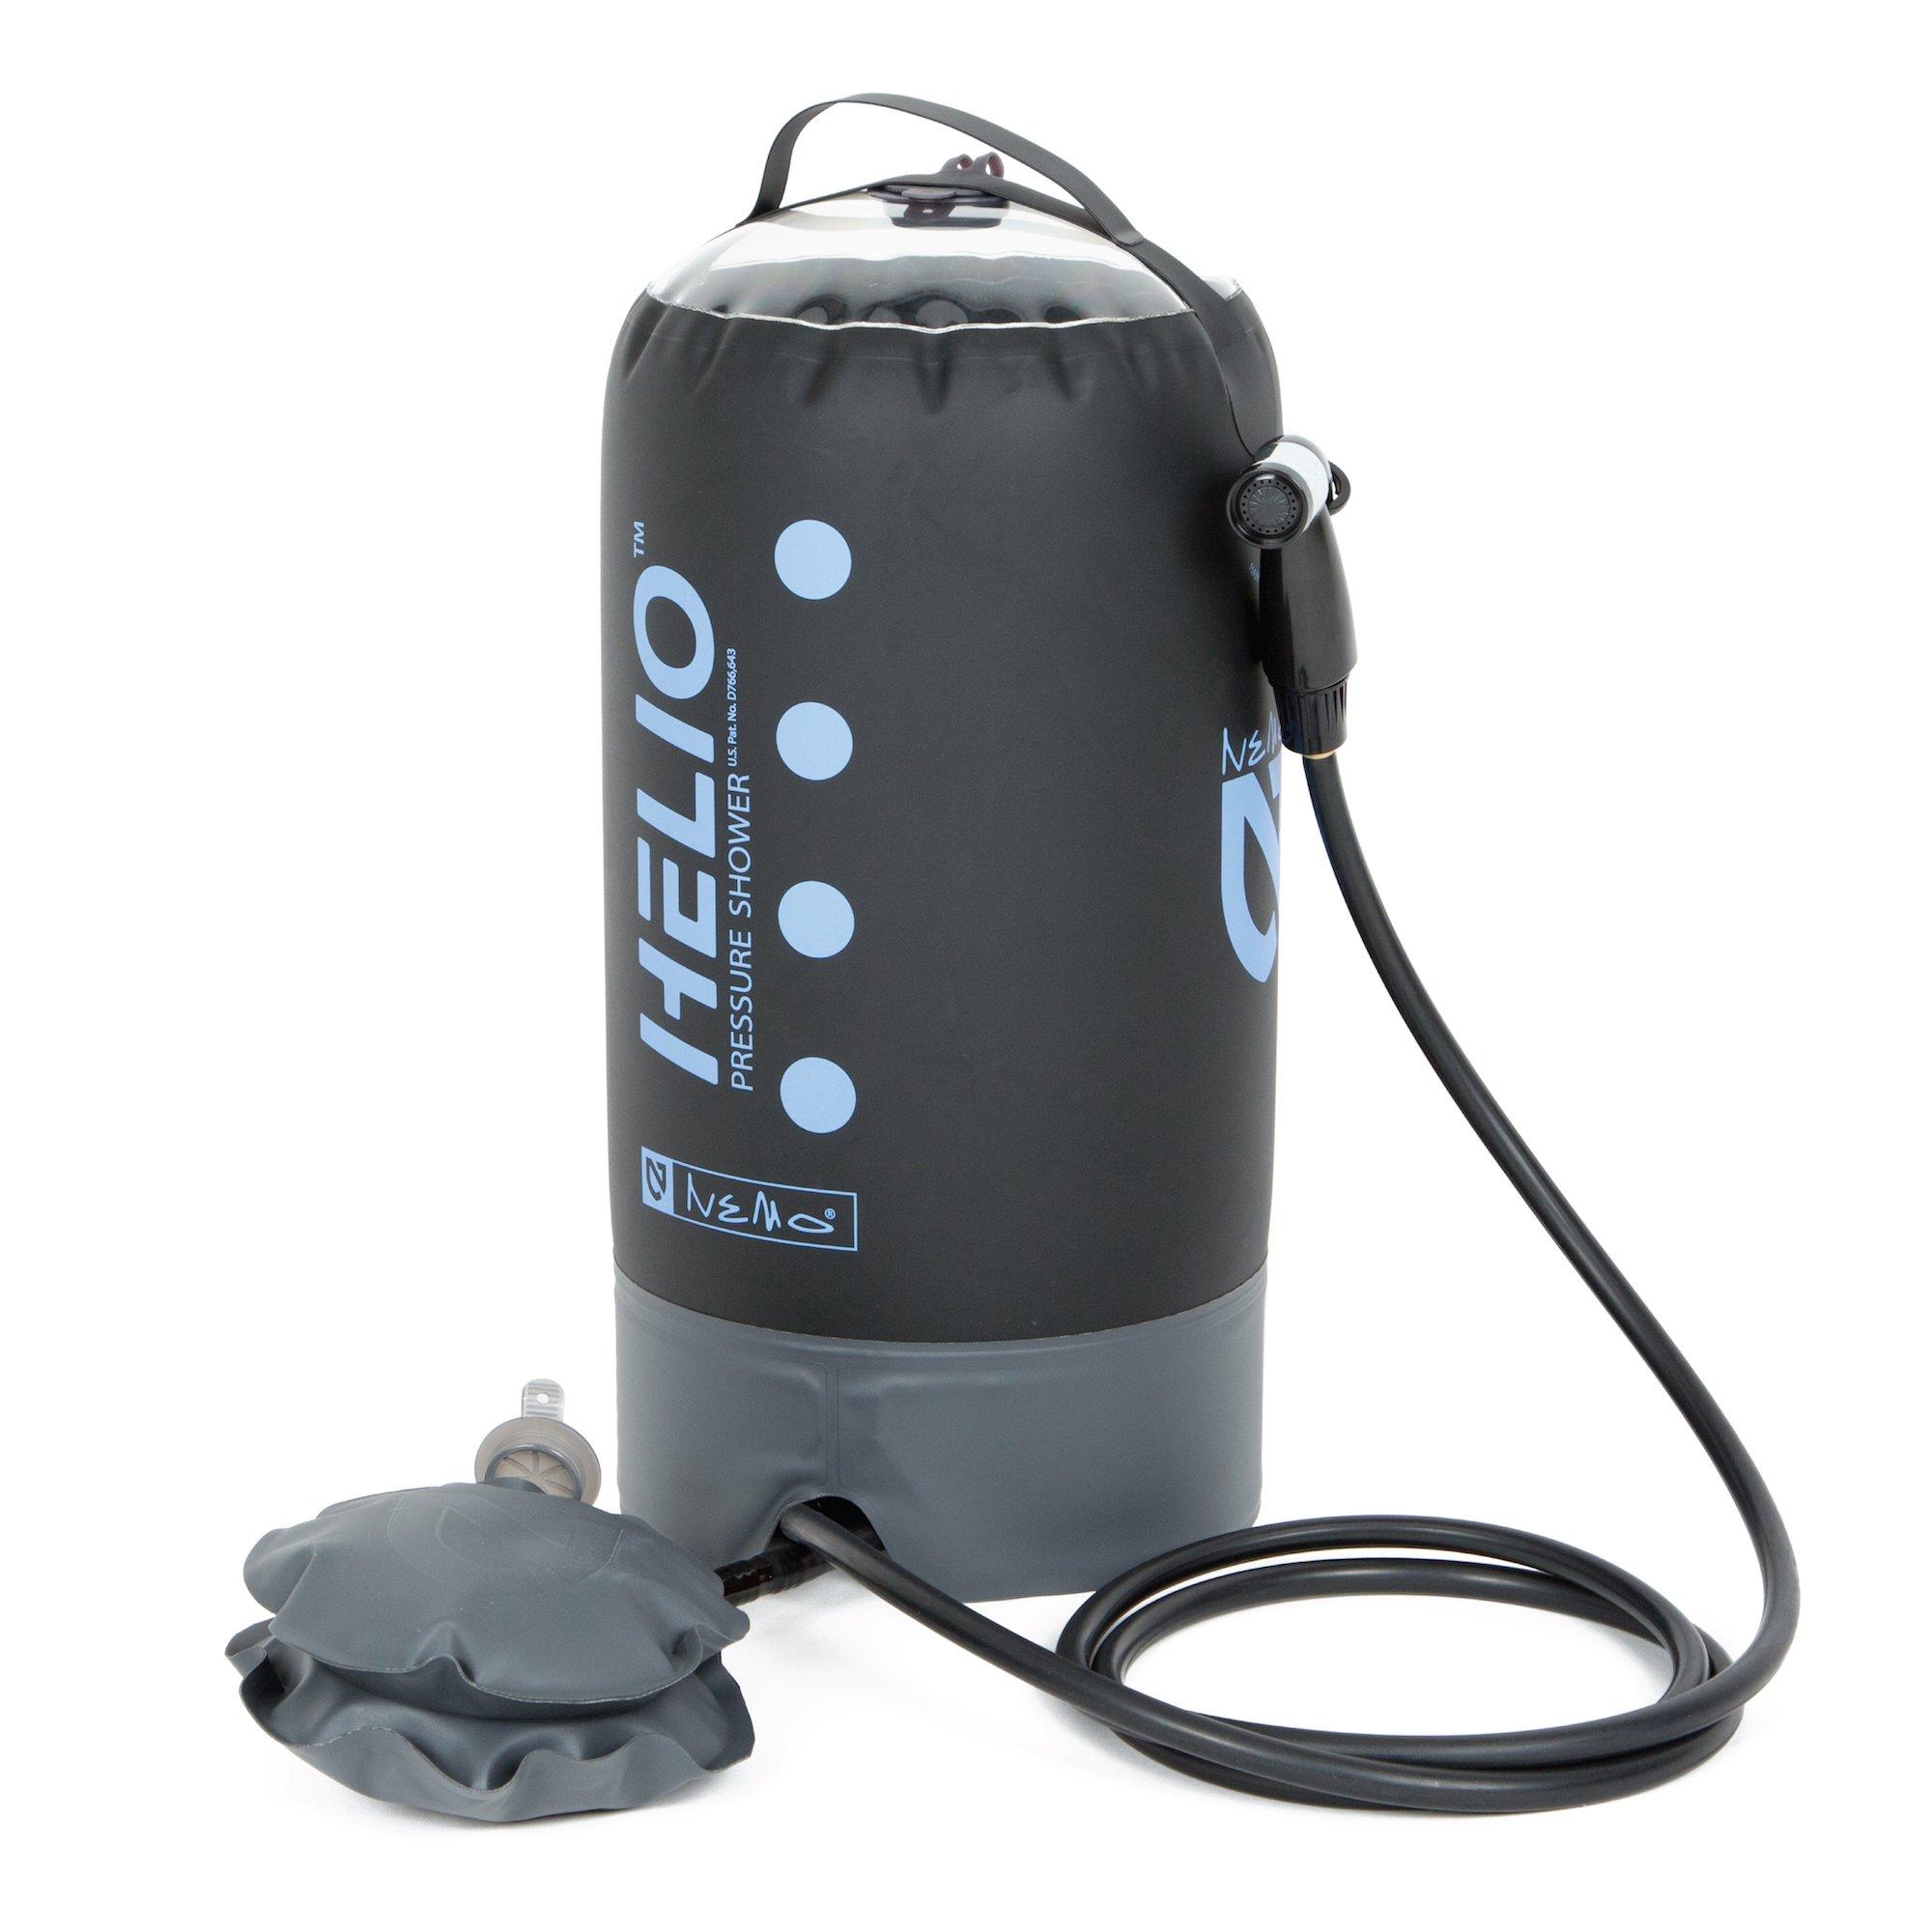 Nemo Equipment Helio Pressure Shower (Black/Periwinkle)